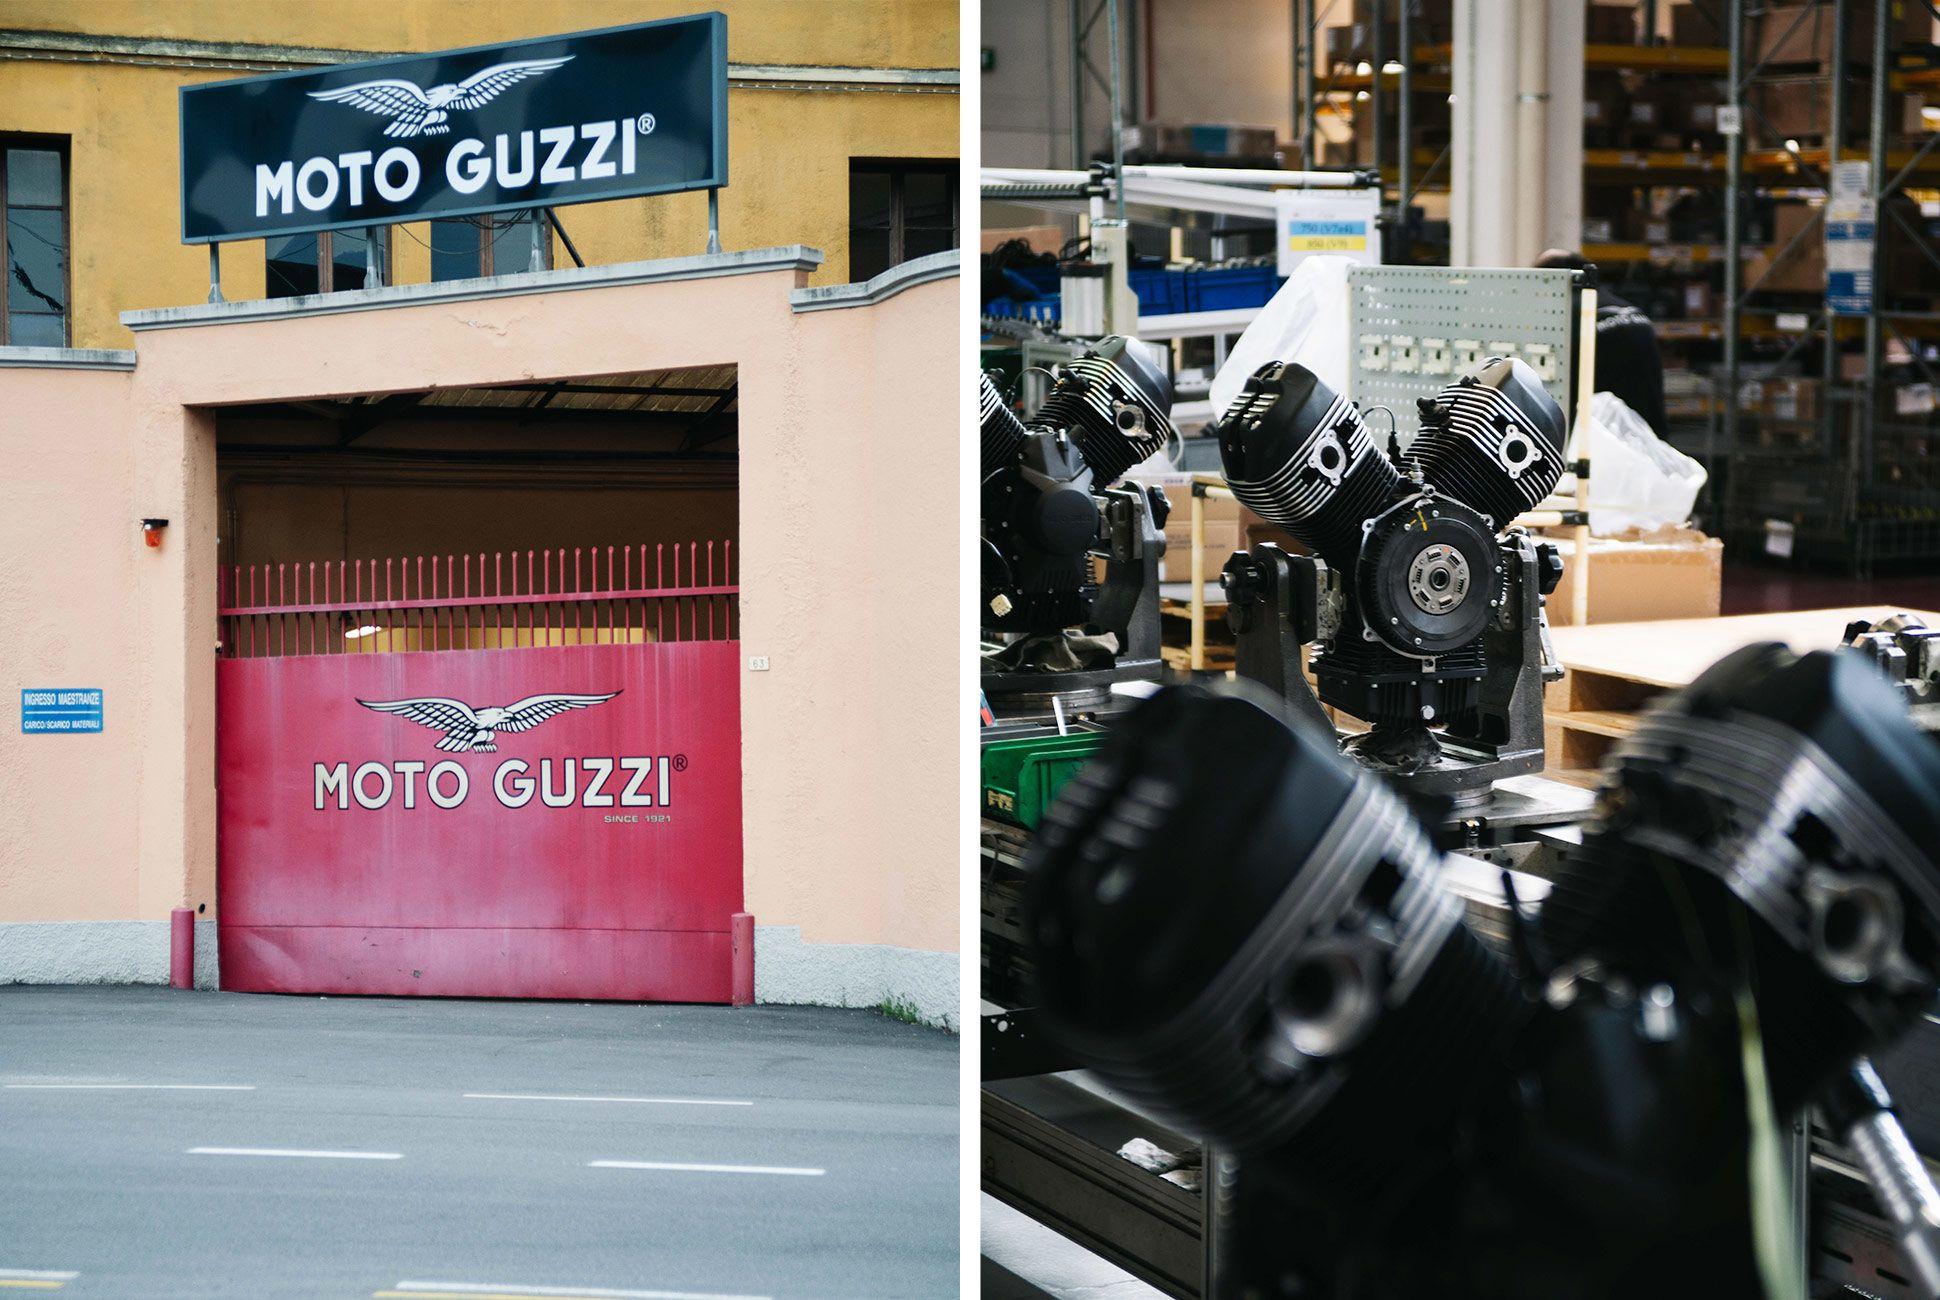 Moto-Guzzi-Factory-Tour-gear-patrol-slide-1